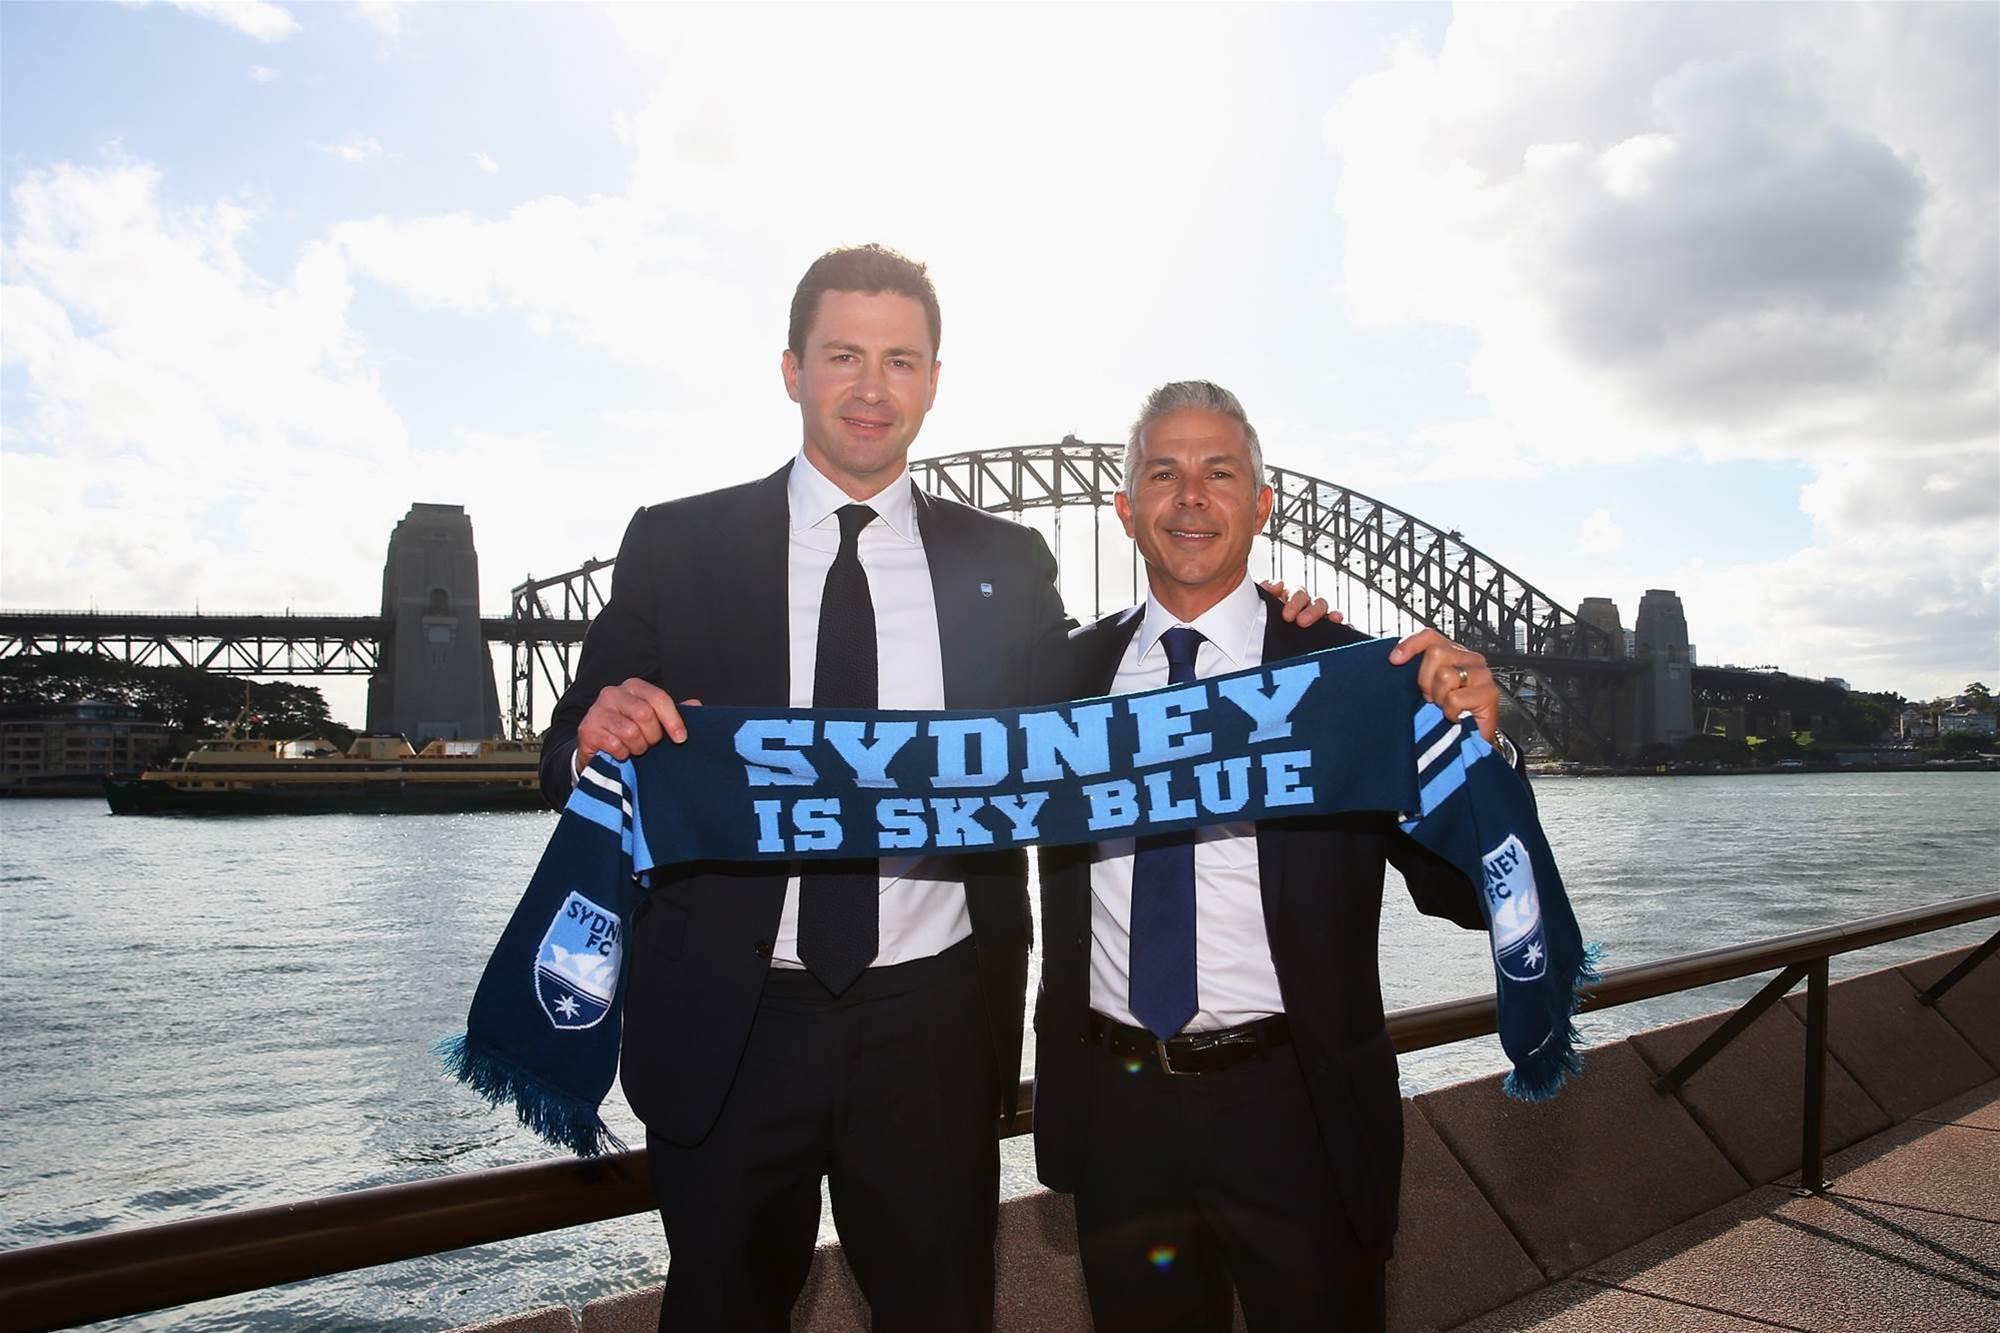 Sydney's Opera House coach reveal